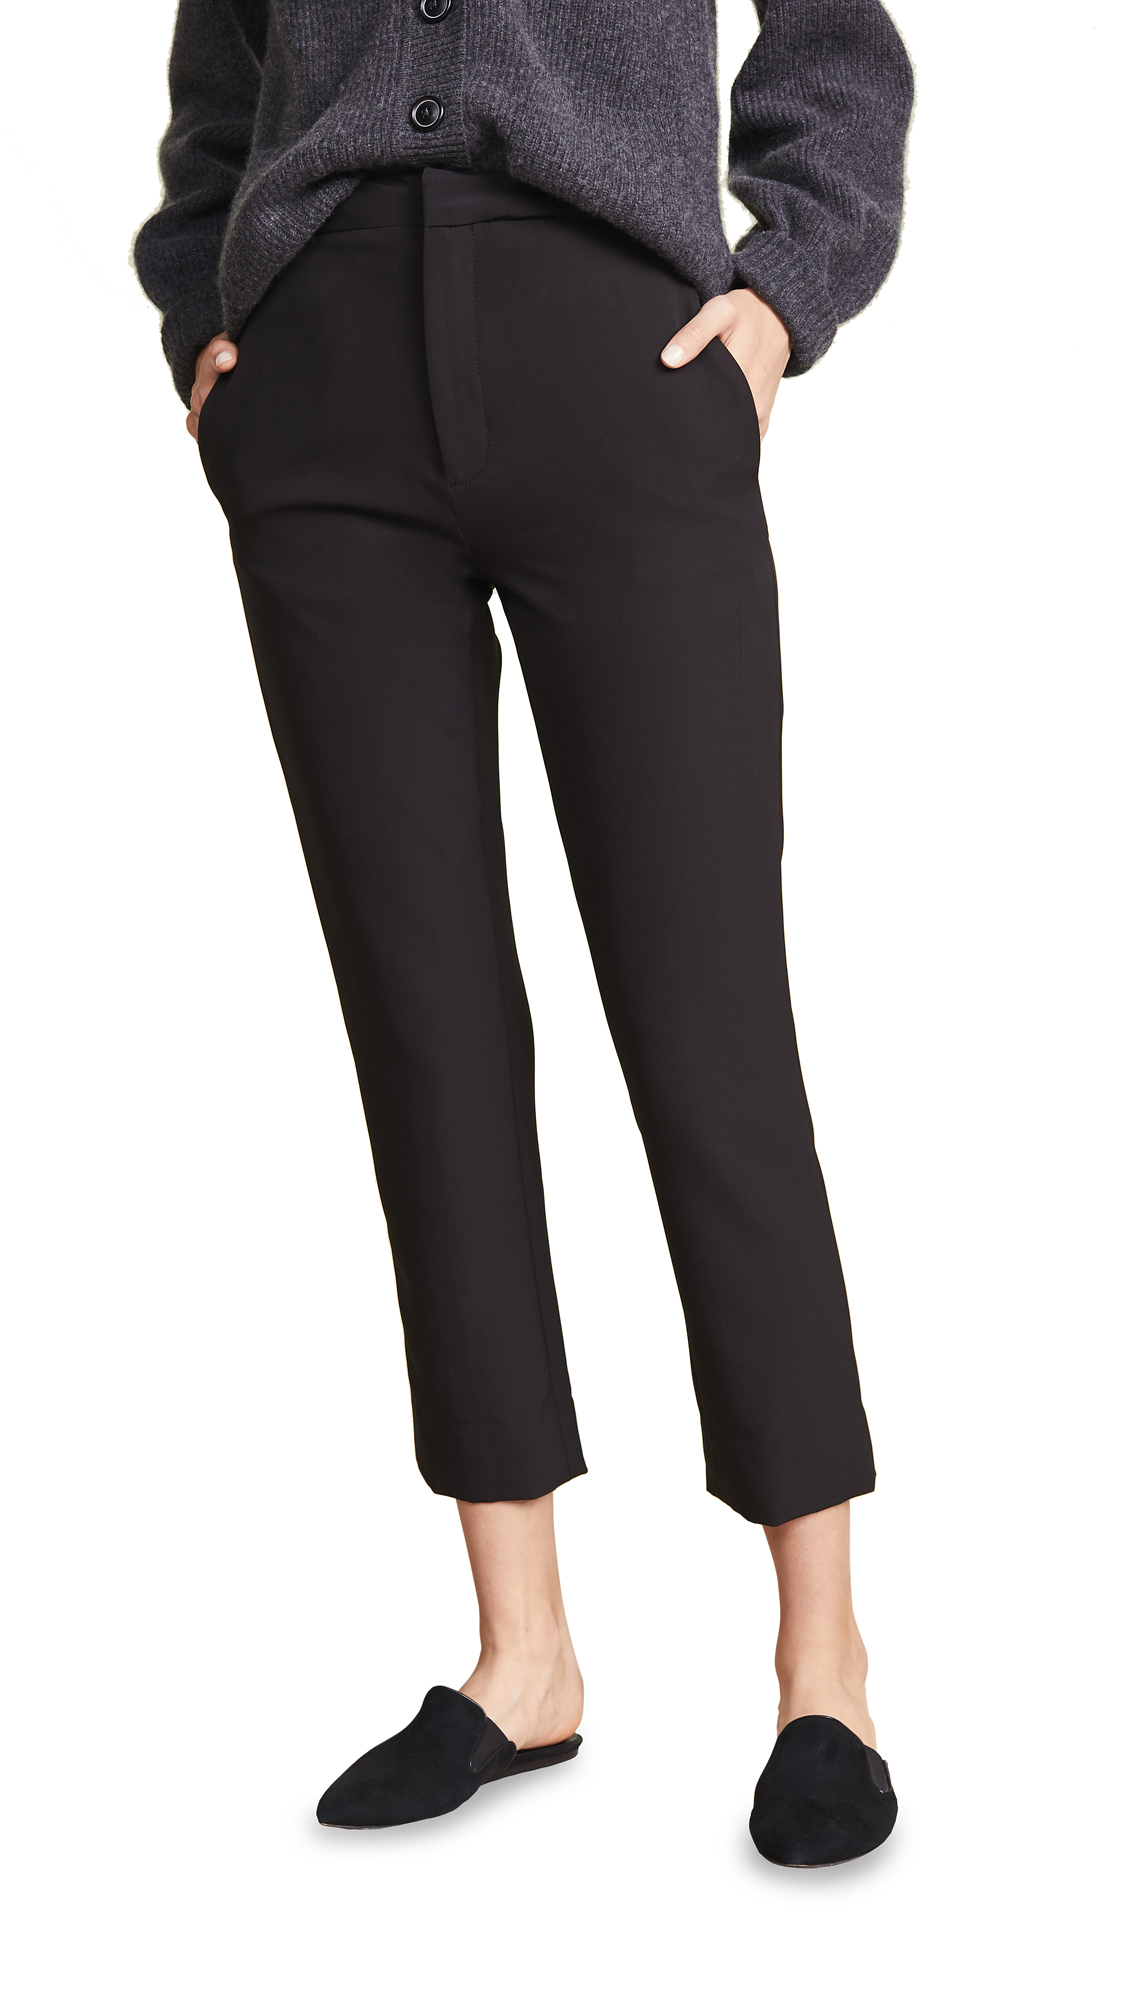 SABLYN Margarita High Waisted Skinny Pants in Black